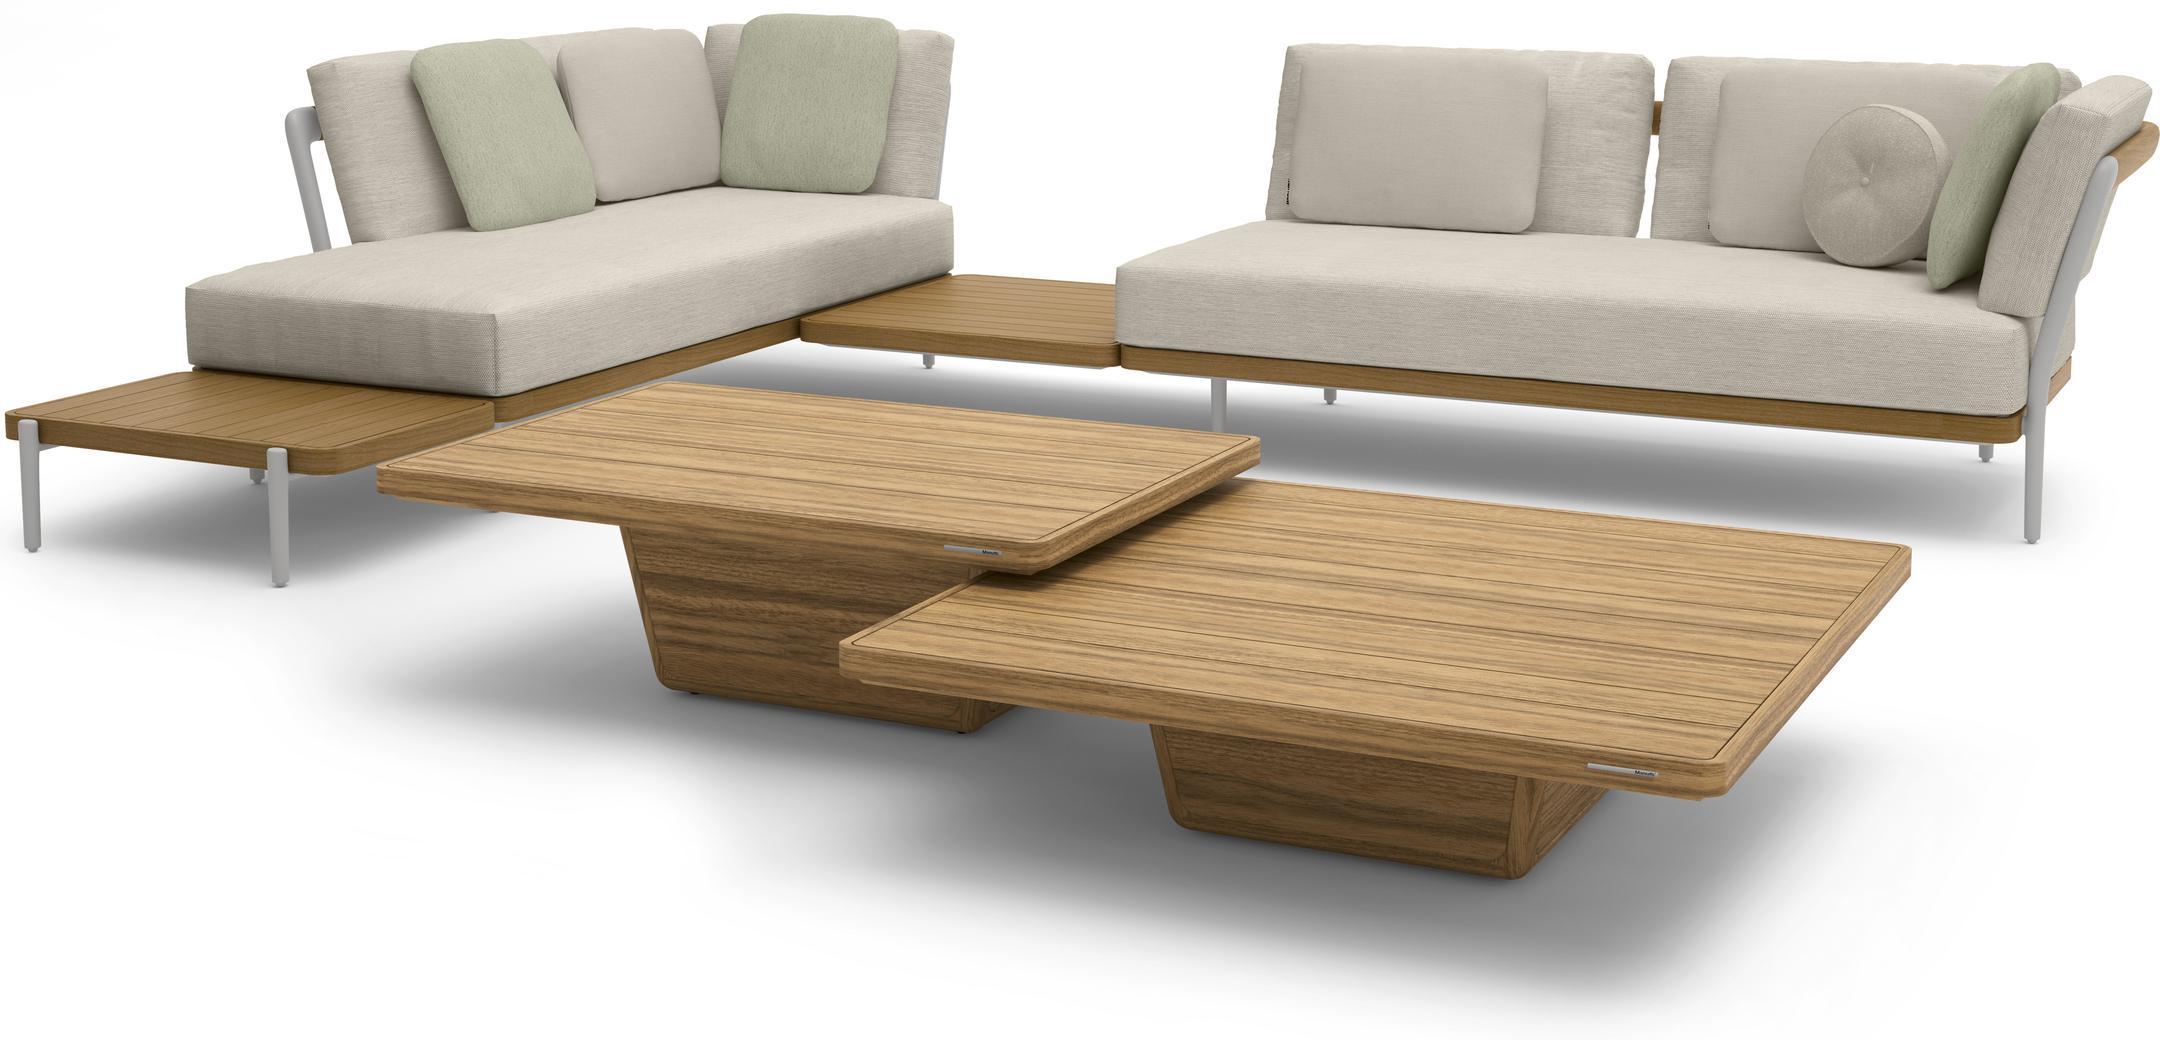 Cobi coffee table 113x113x30 brushed teak